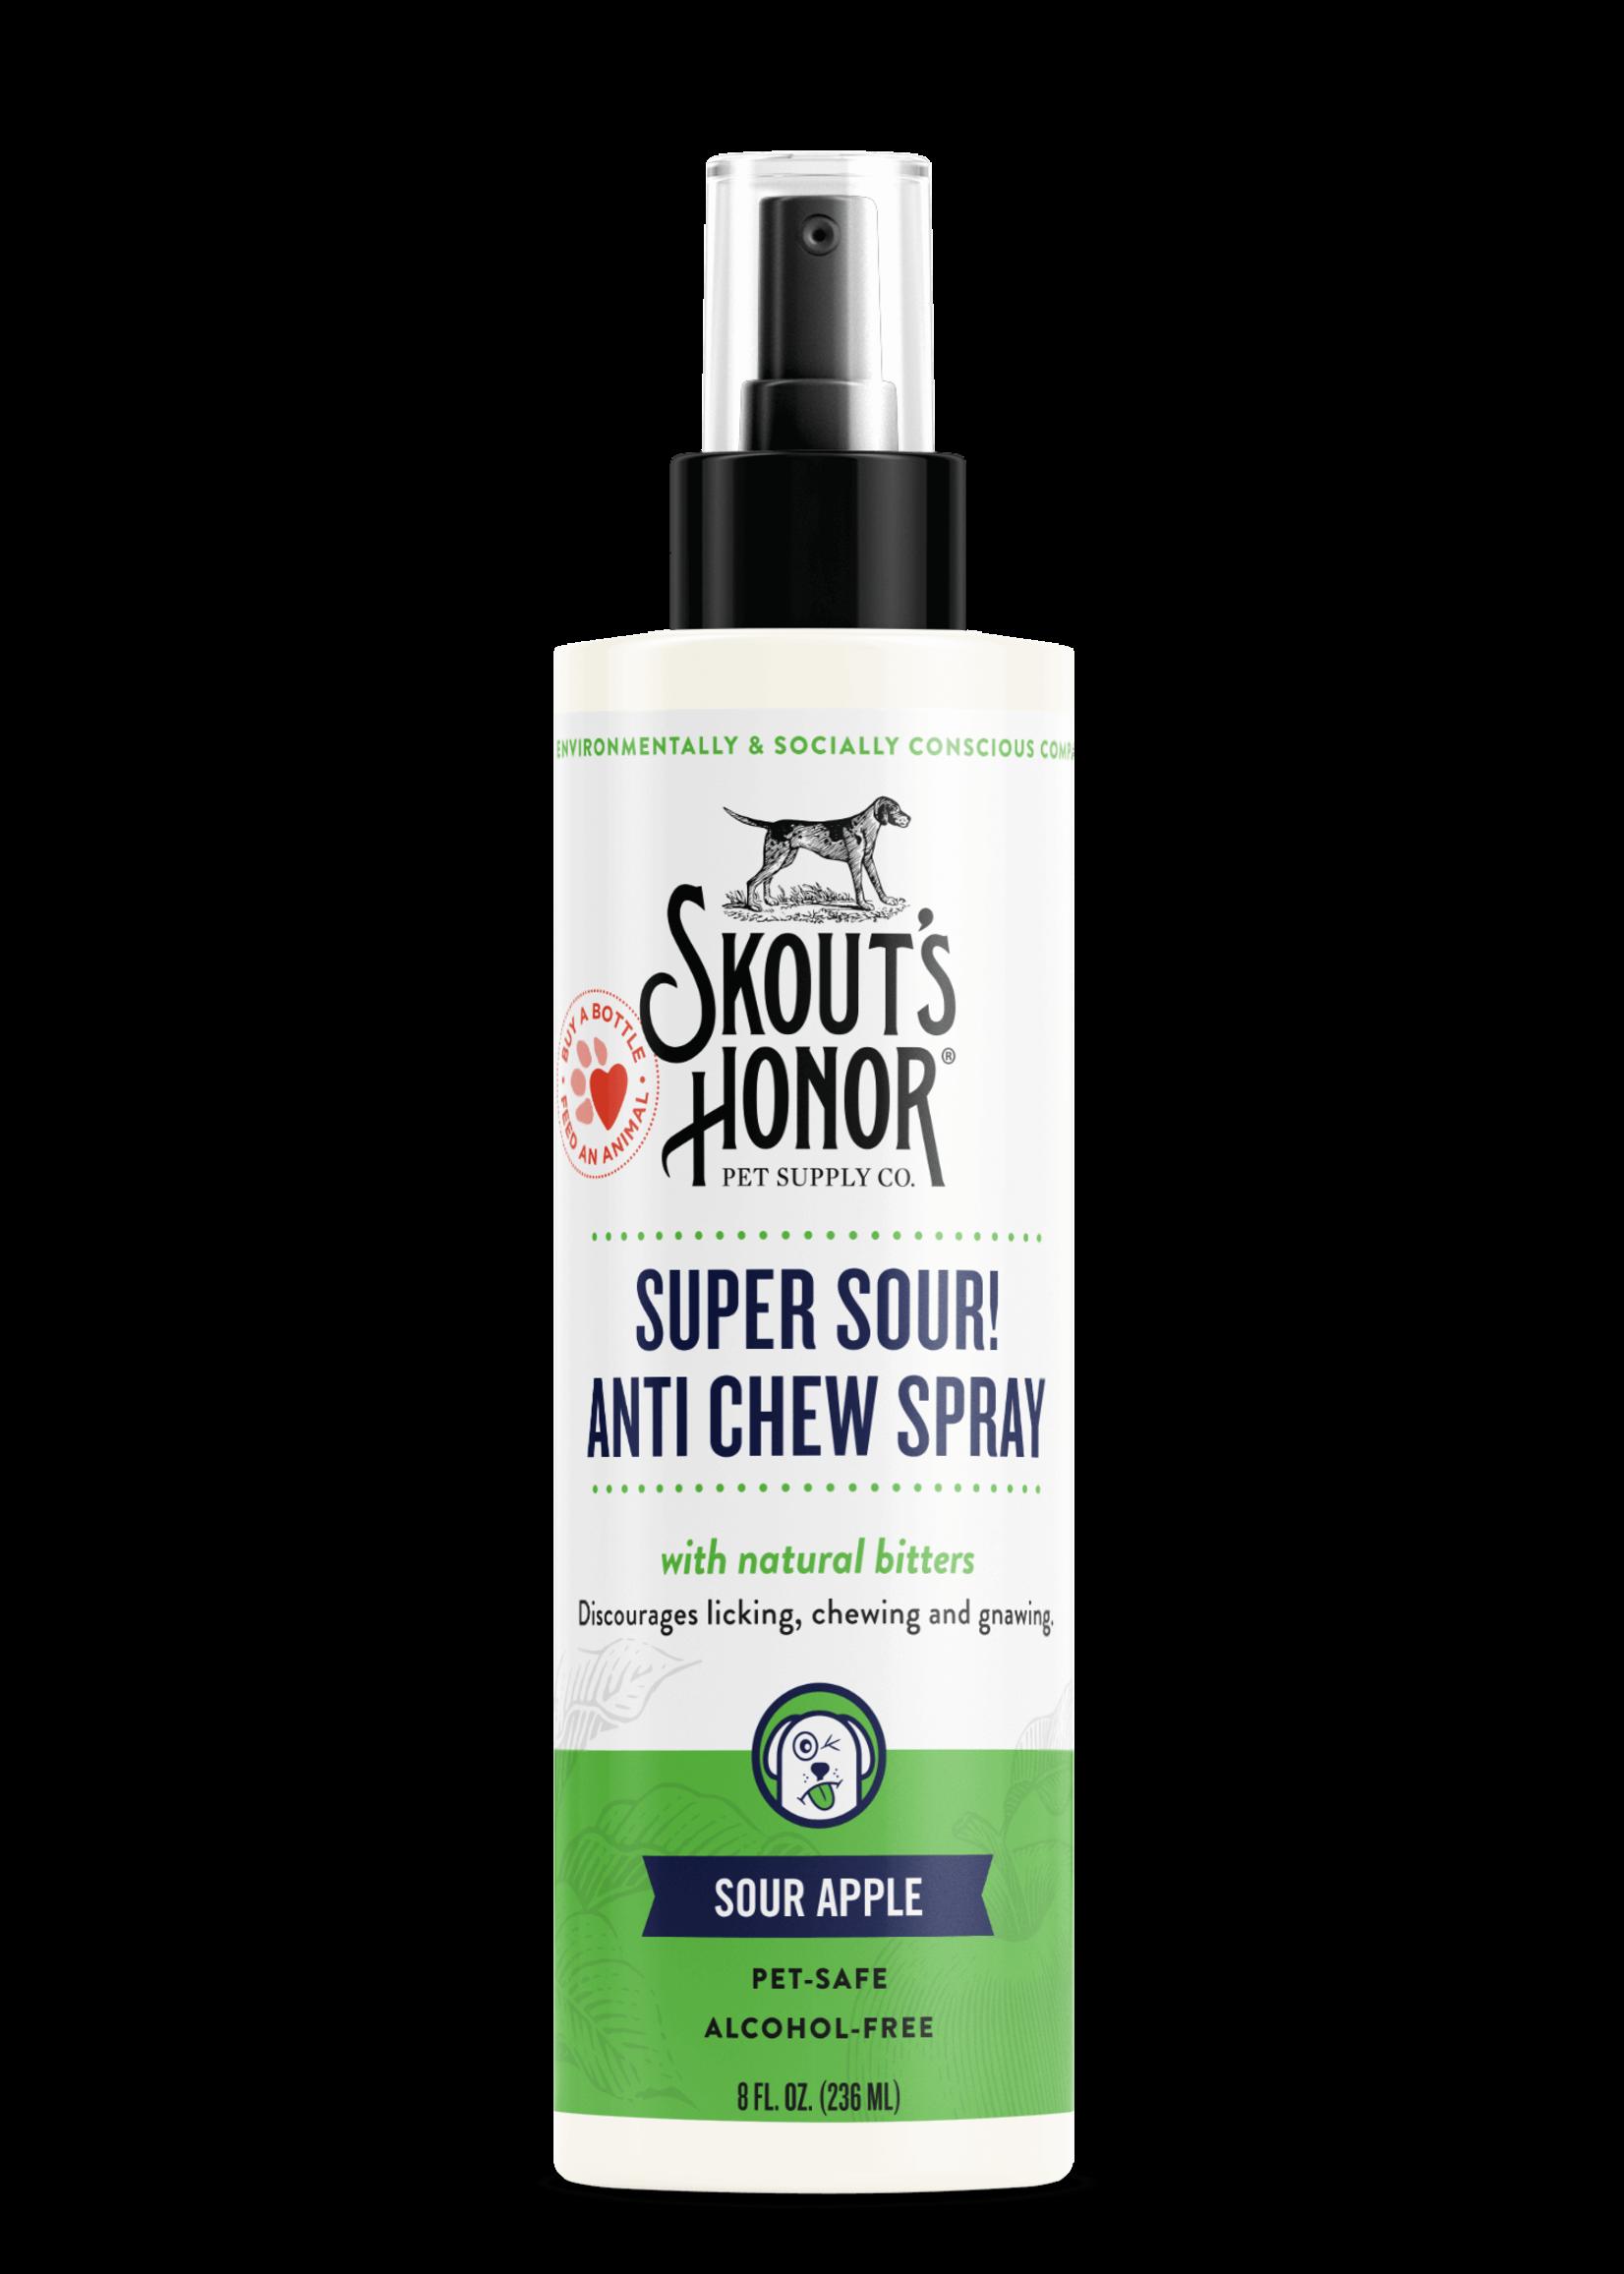 Skout's Honor Skout's Honor Dog Anti Chew Spray 8oz